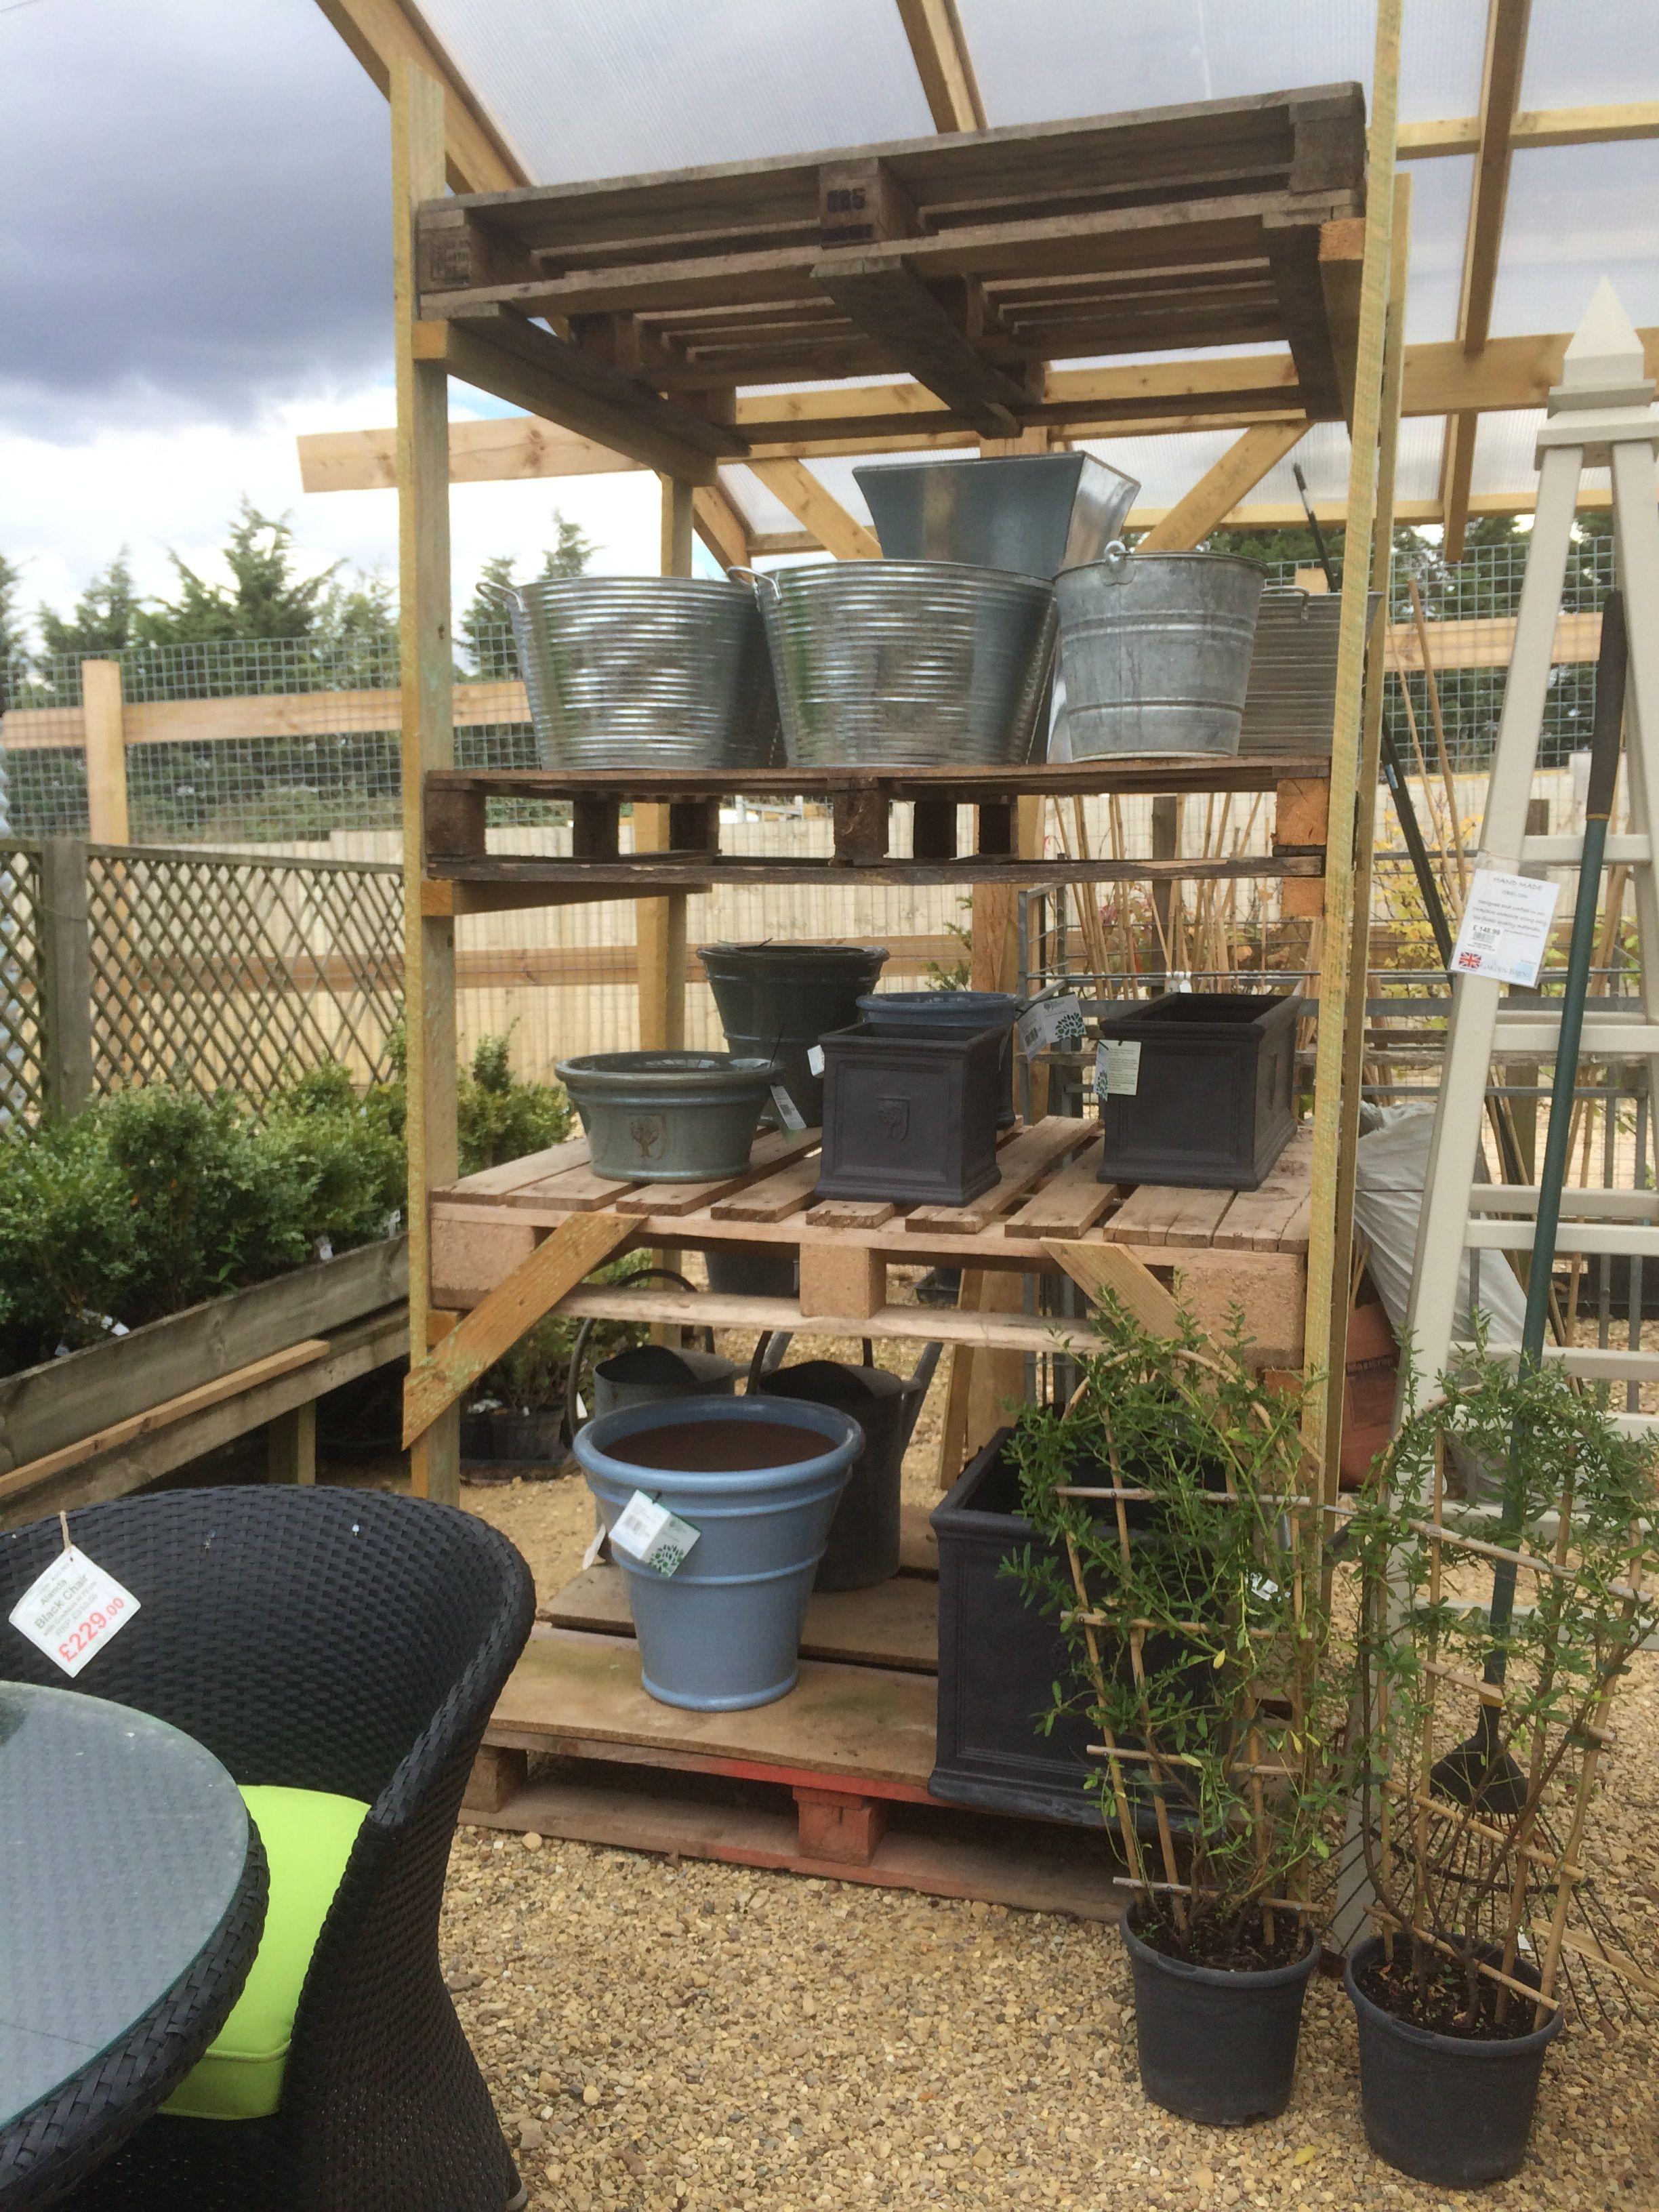 Stamford Garden Centre - Garden - Plants - Visual Merchandising - Layout - Landscape - Lifestyle - www.clearretailgroup.eu